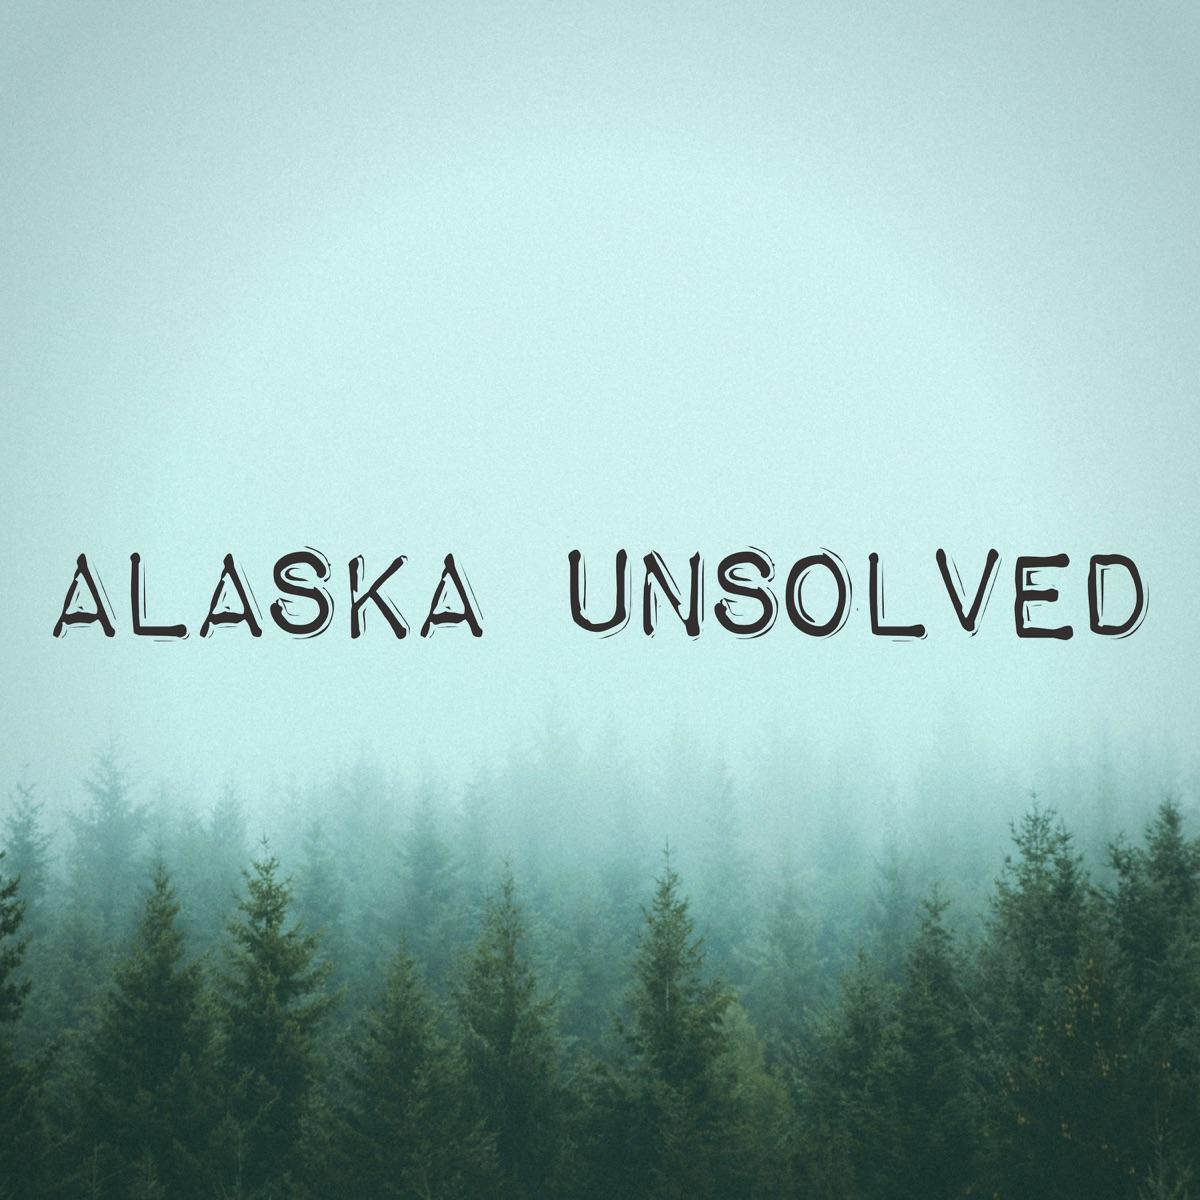 Alaska Unsolved